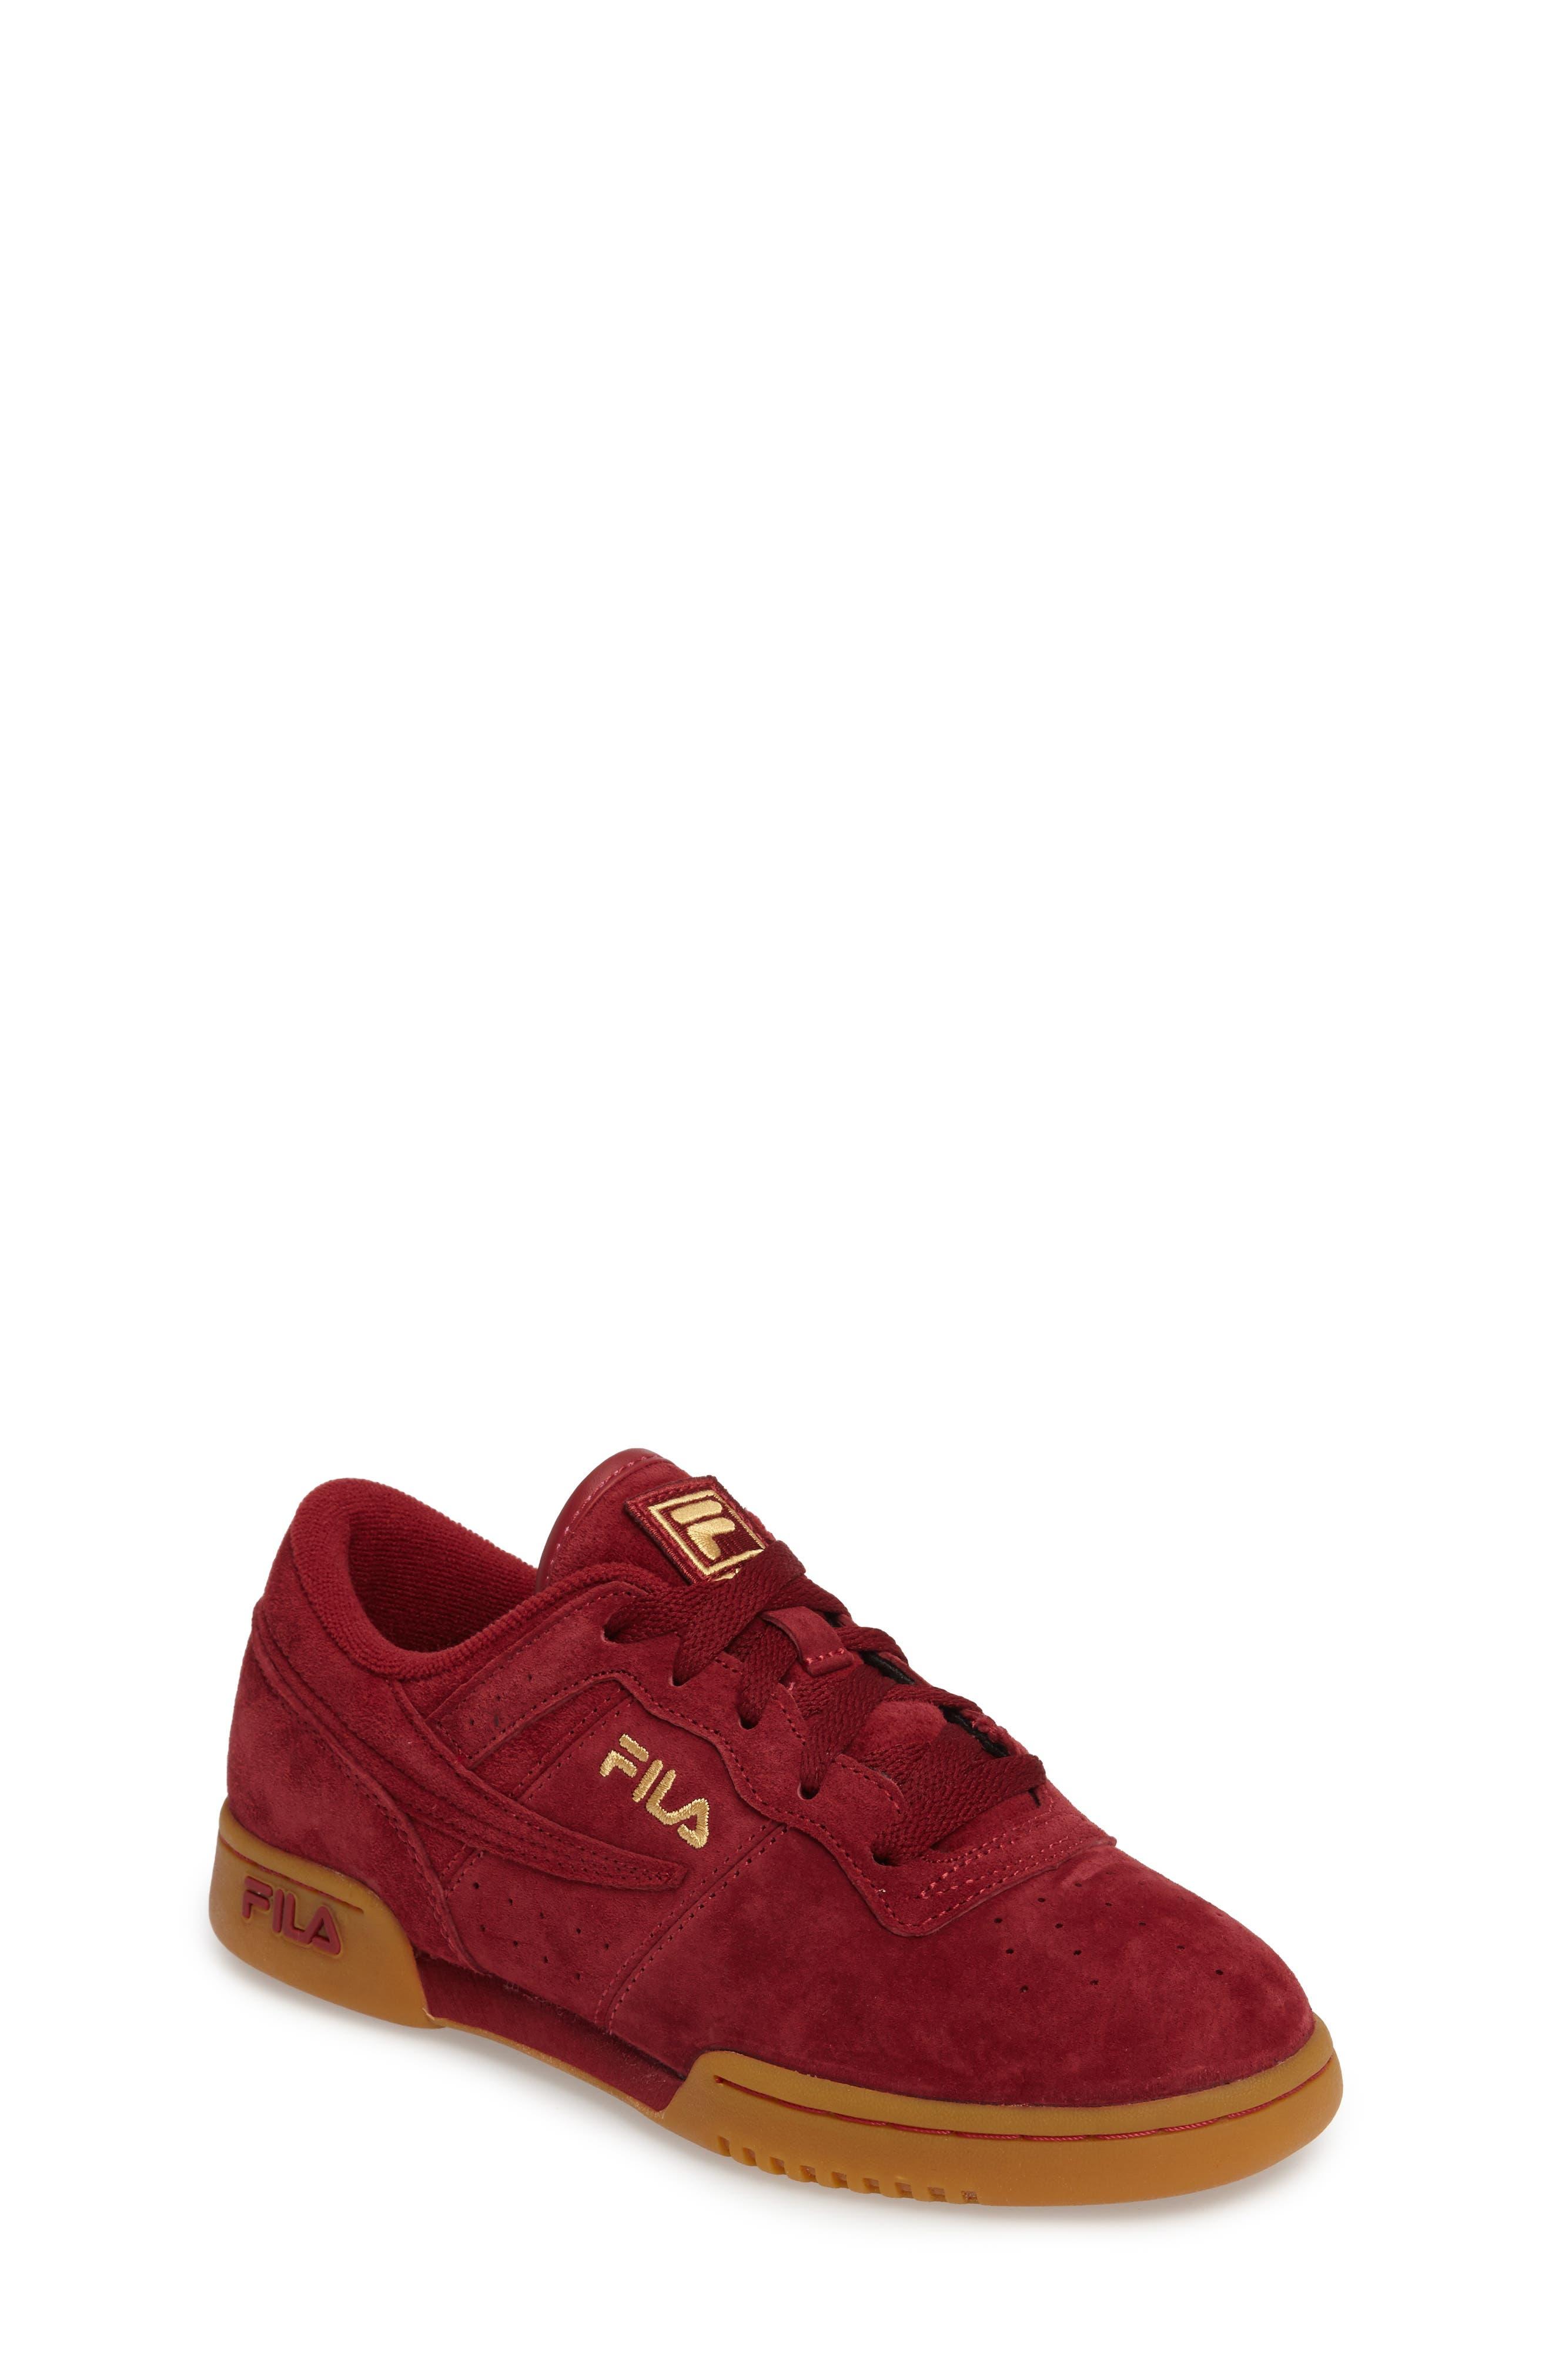 Heritage Sneaker,                             Main thumbnail 1, color,                             600